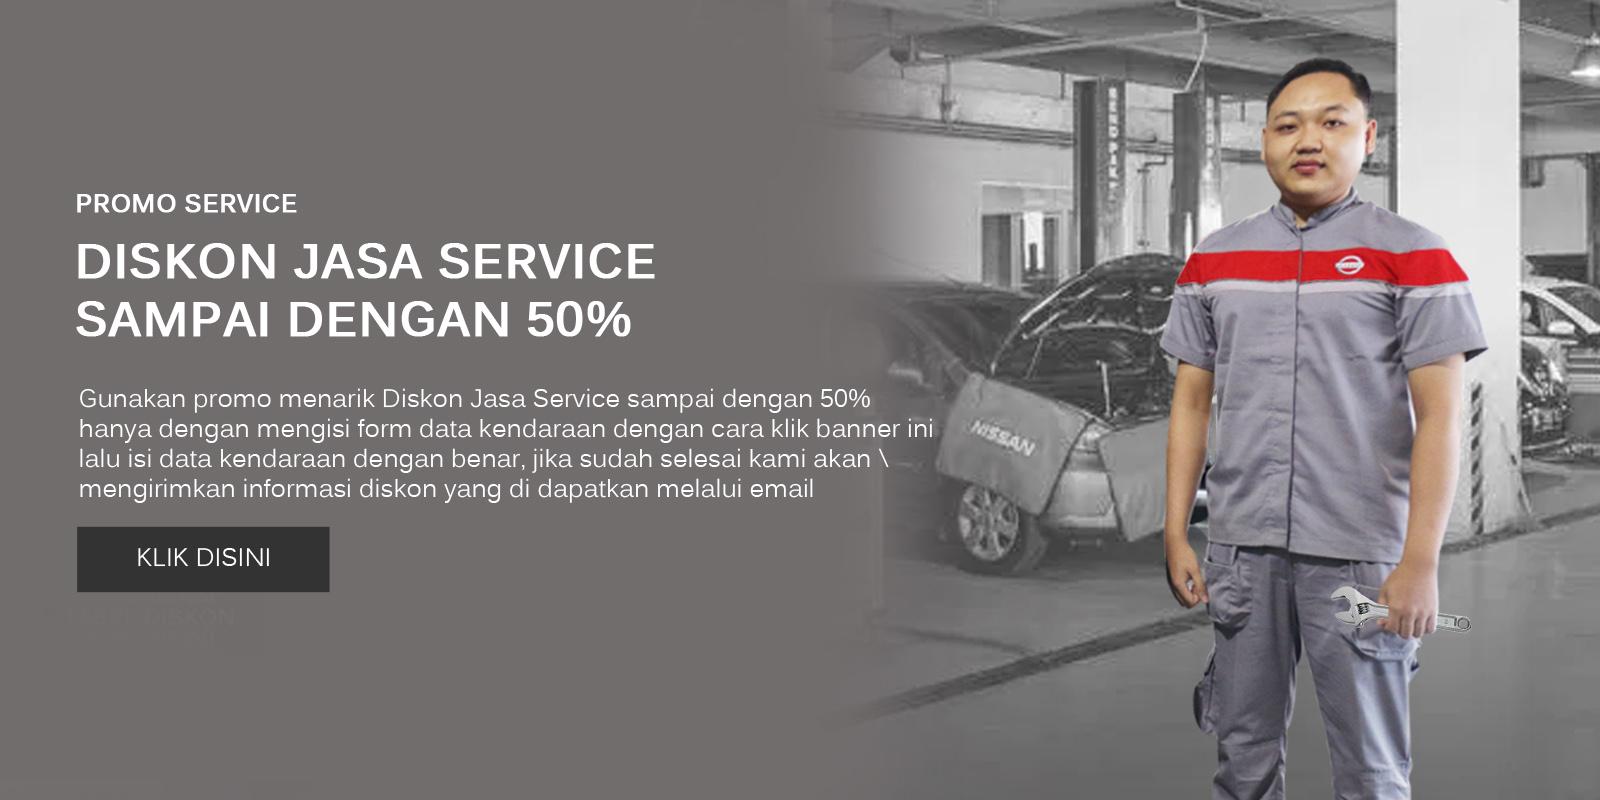 Nissan service history